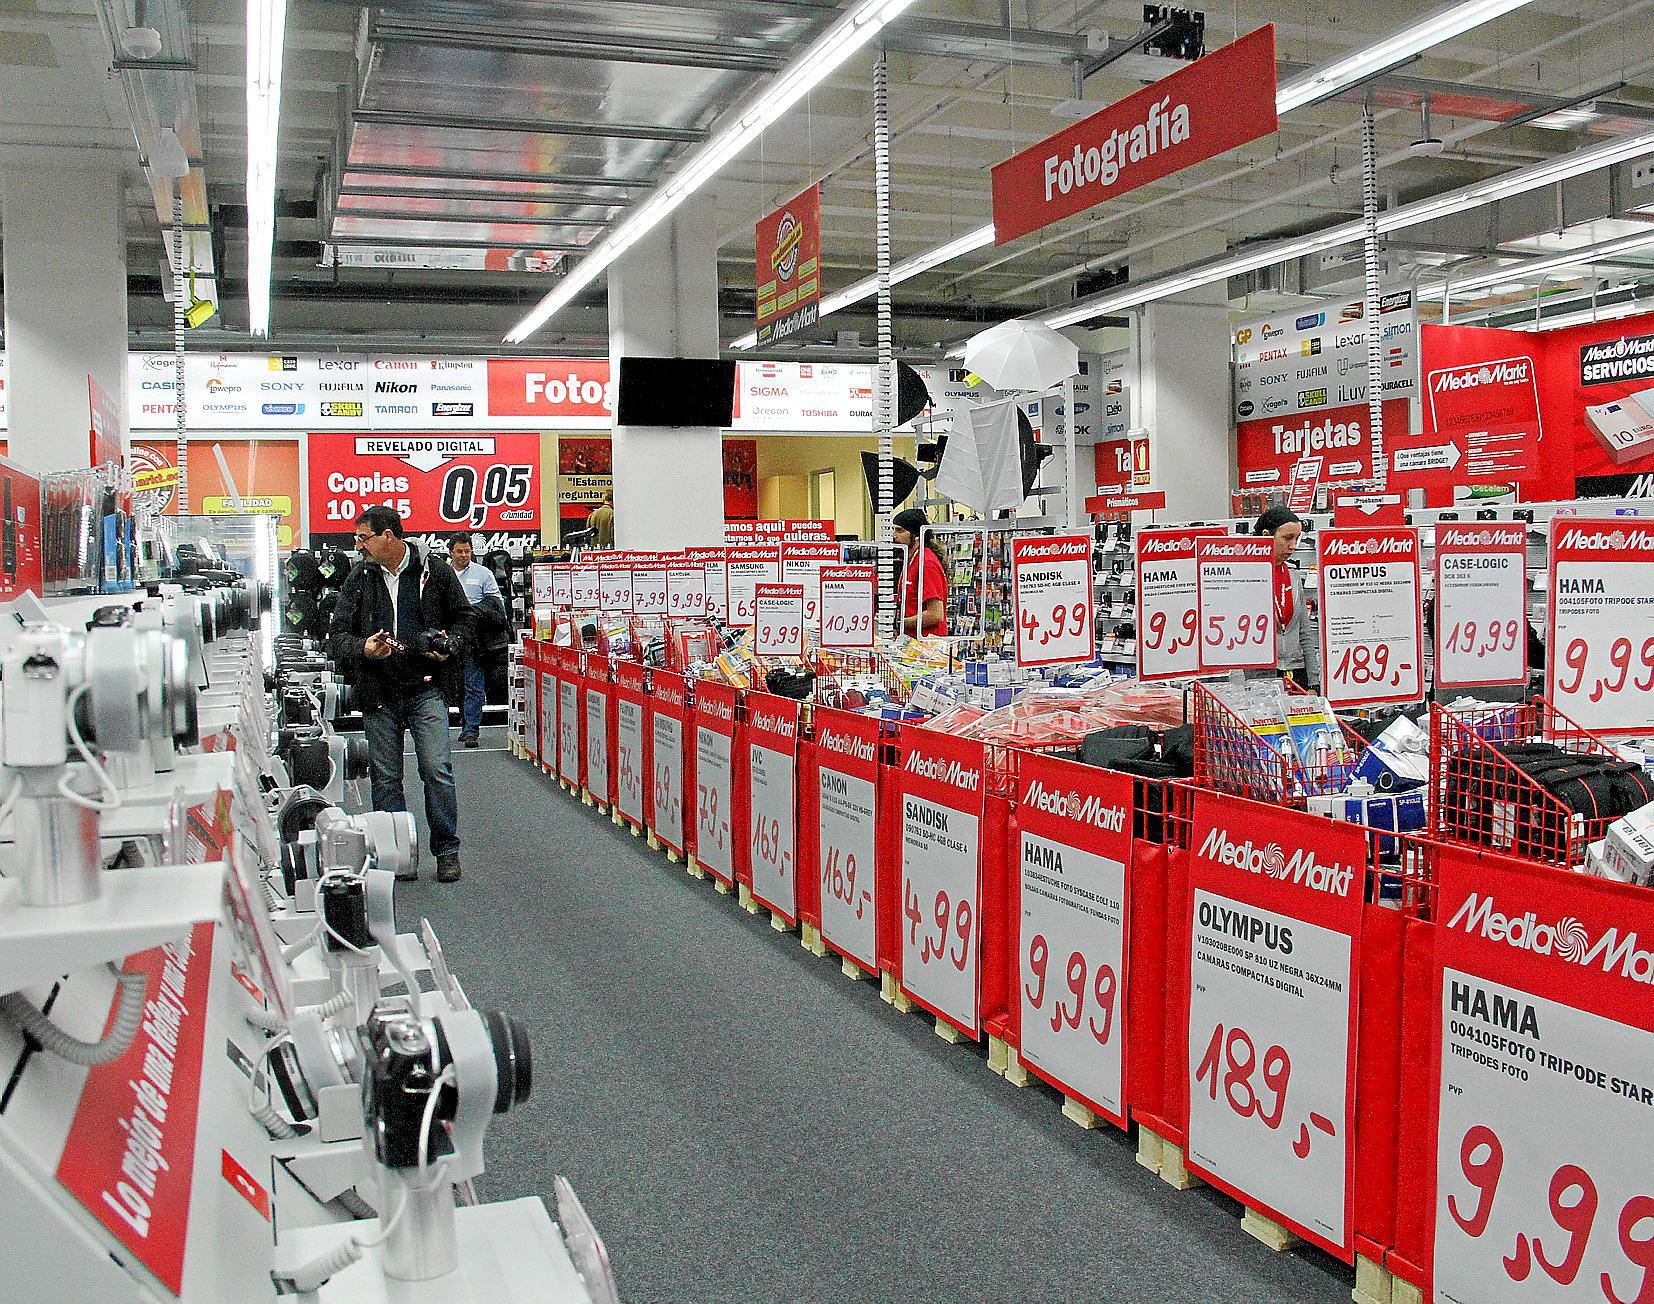 Amerikanischer Kühlschrank Media Markt : Media markt siemens geschirrspüler cm: siemens geschirrspüler sx ce